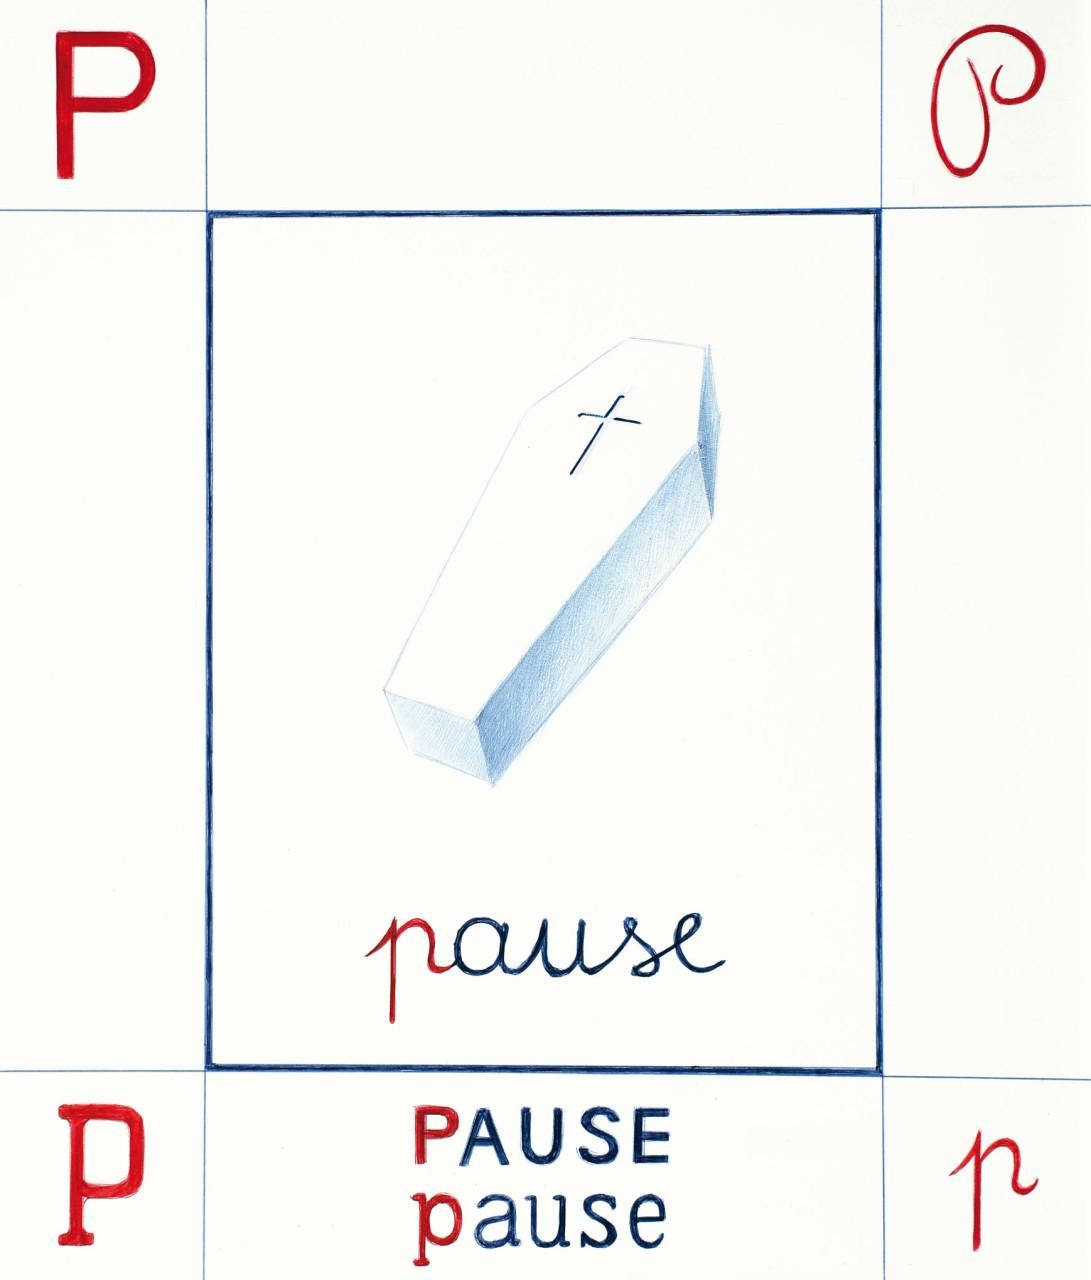 16P-pause_bassa